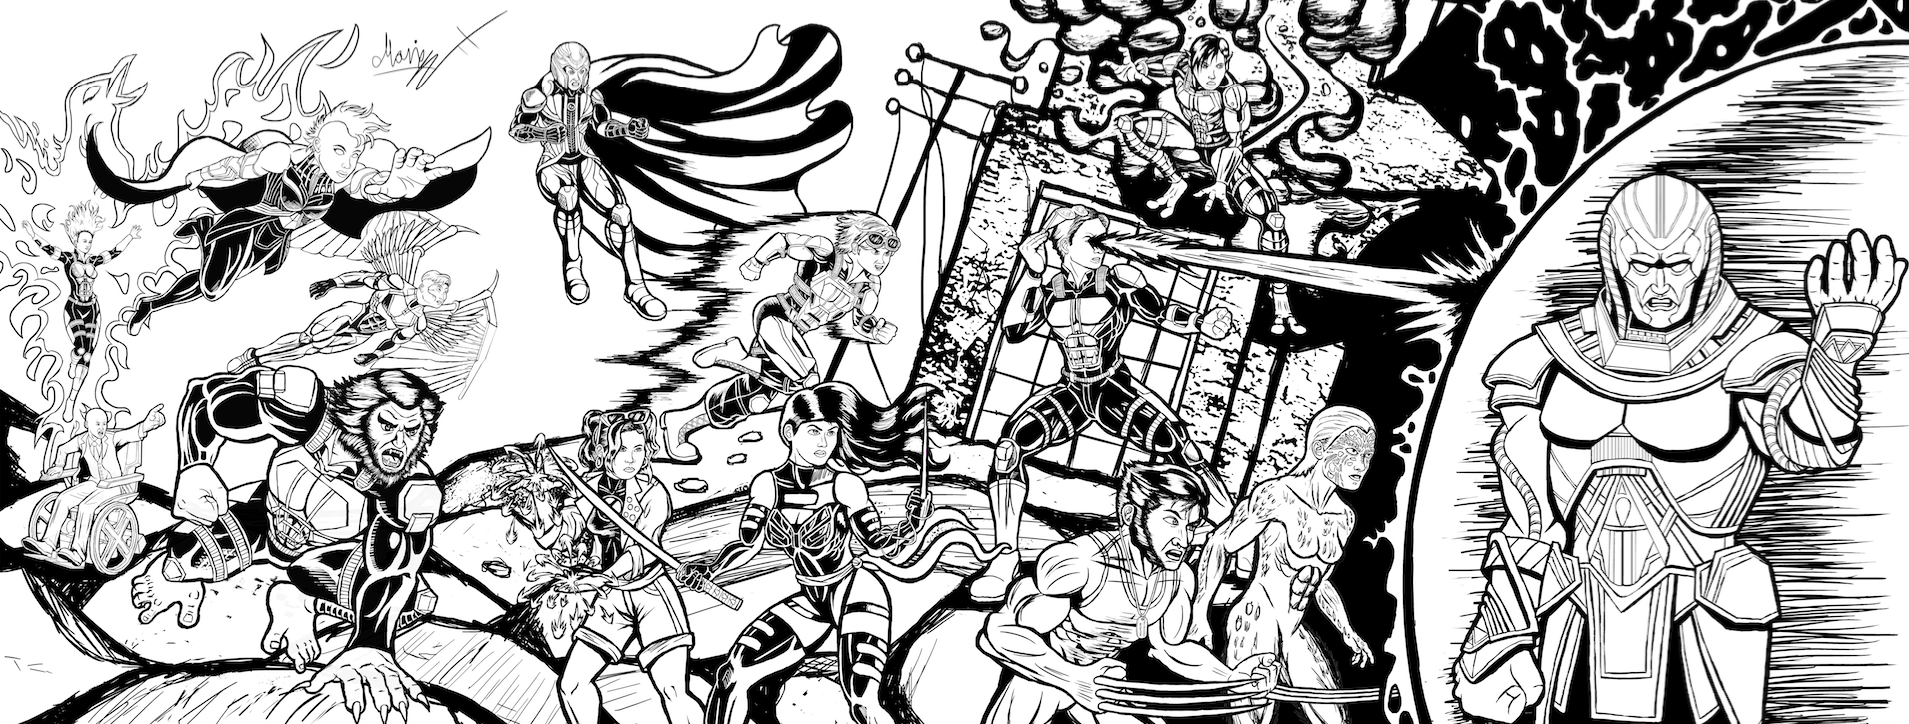 Inked X-Men: Apocalypse Jim lee 90's cover Homage